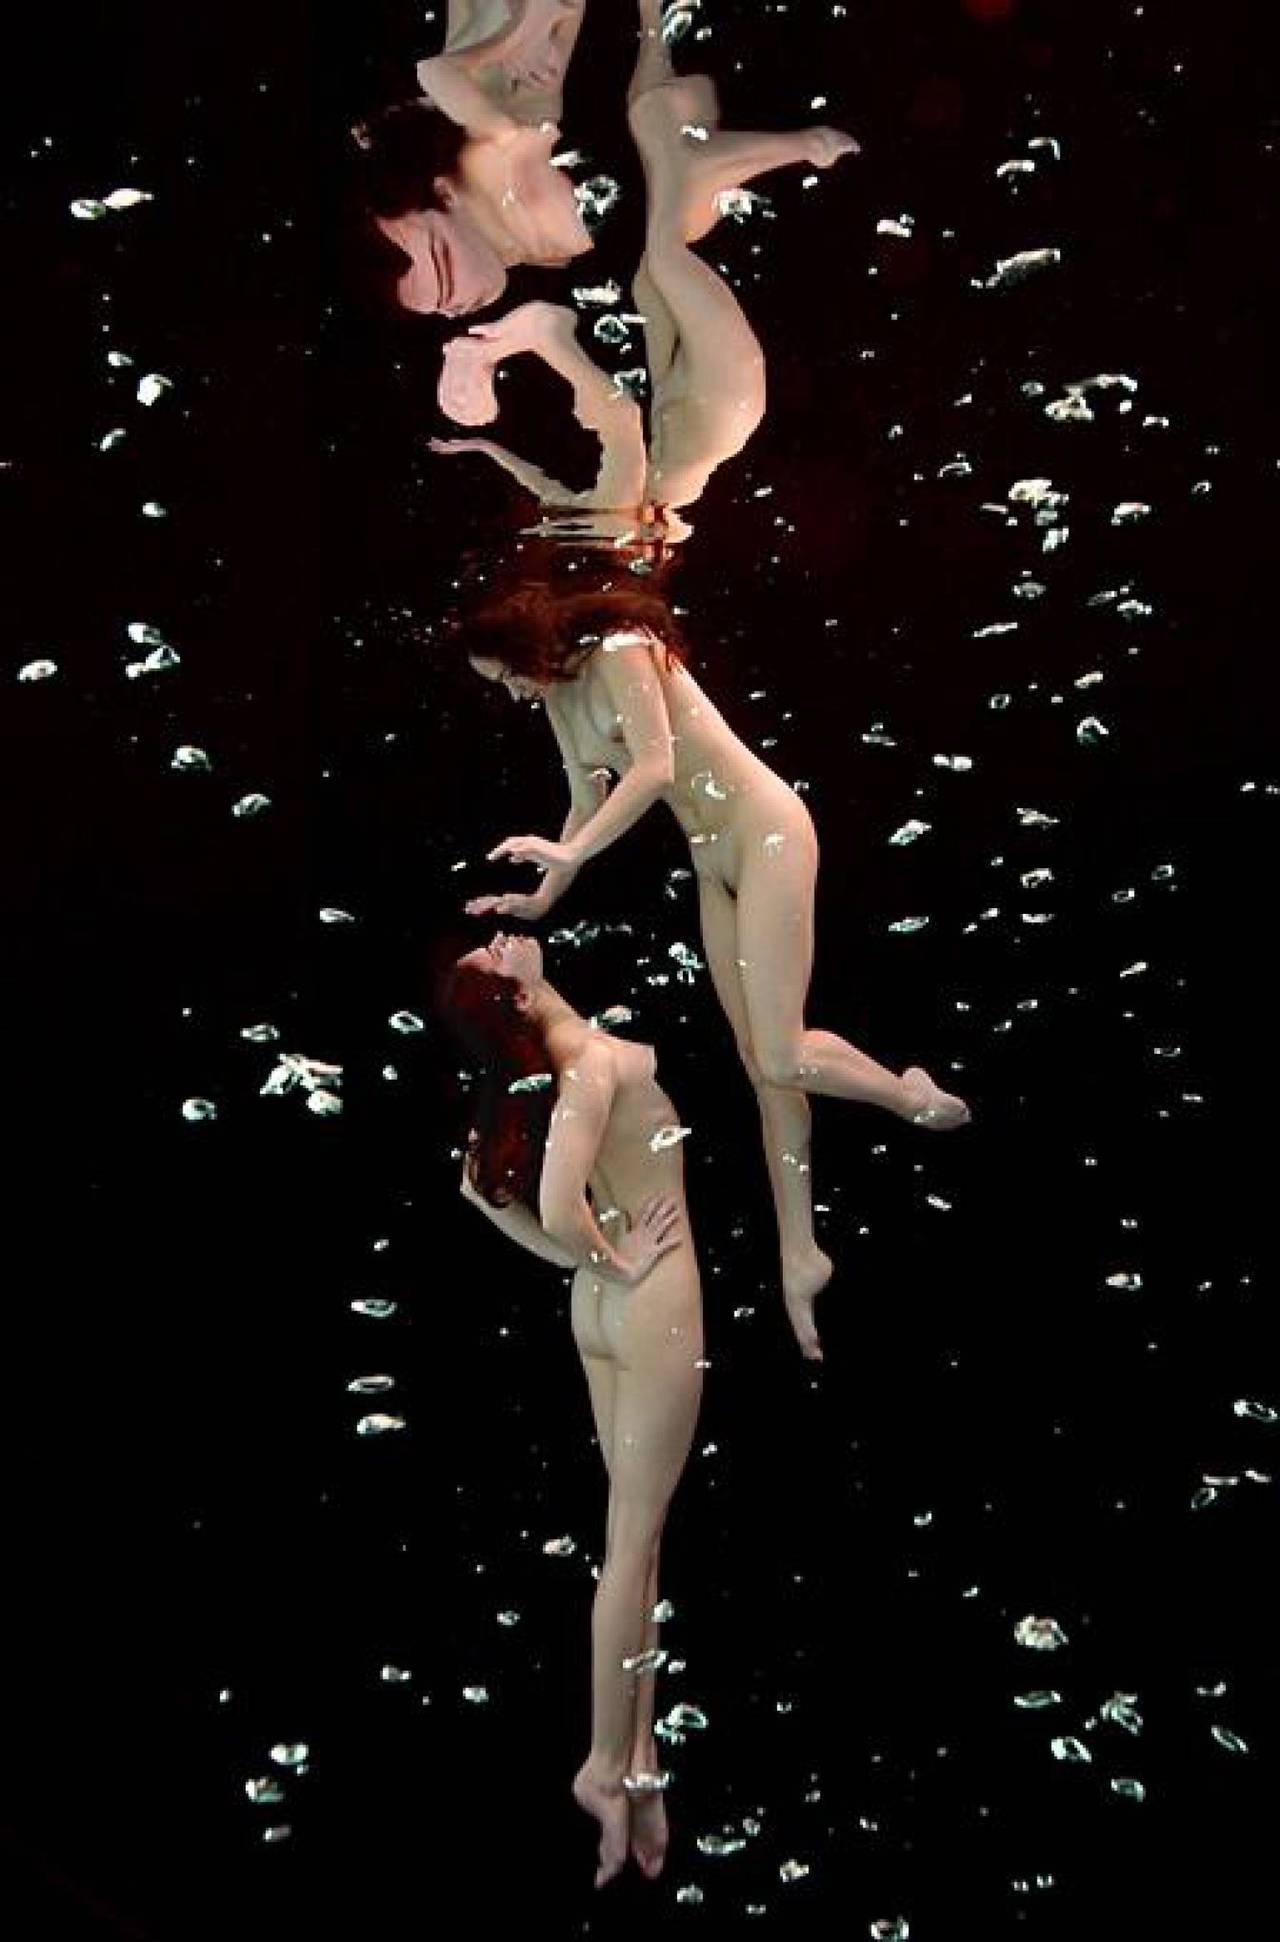 Underwater Study # 2517